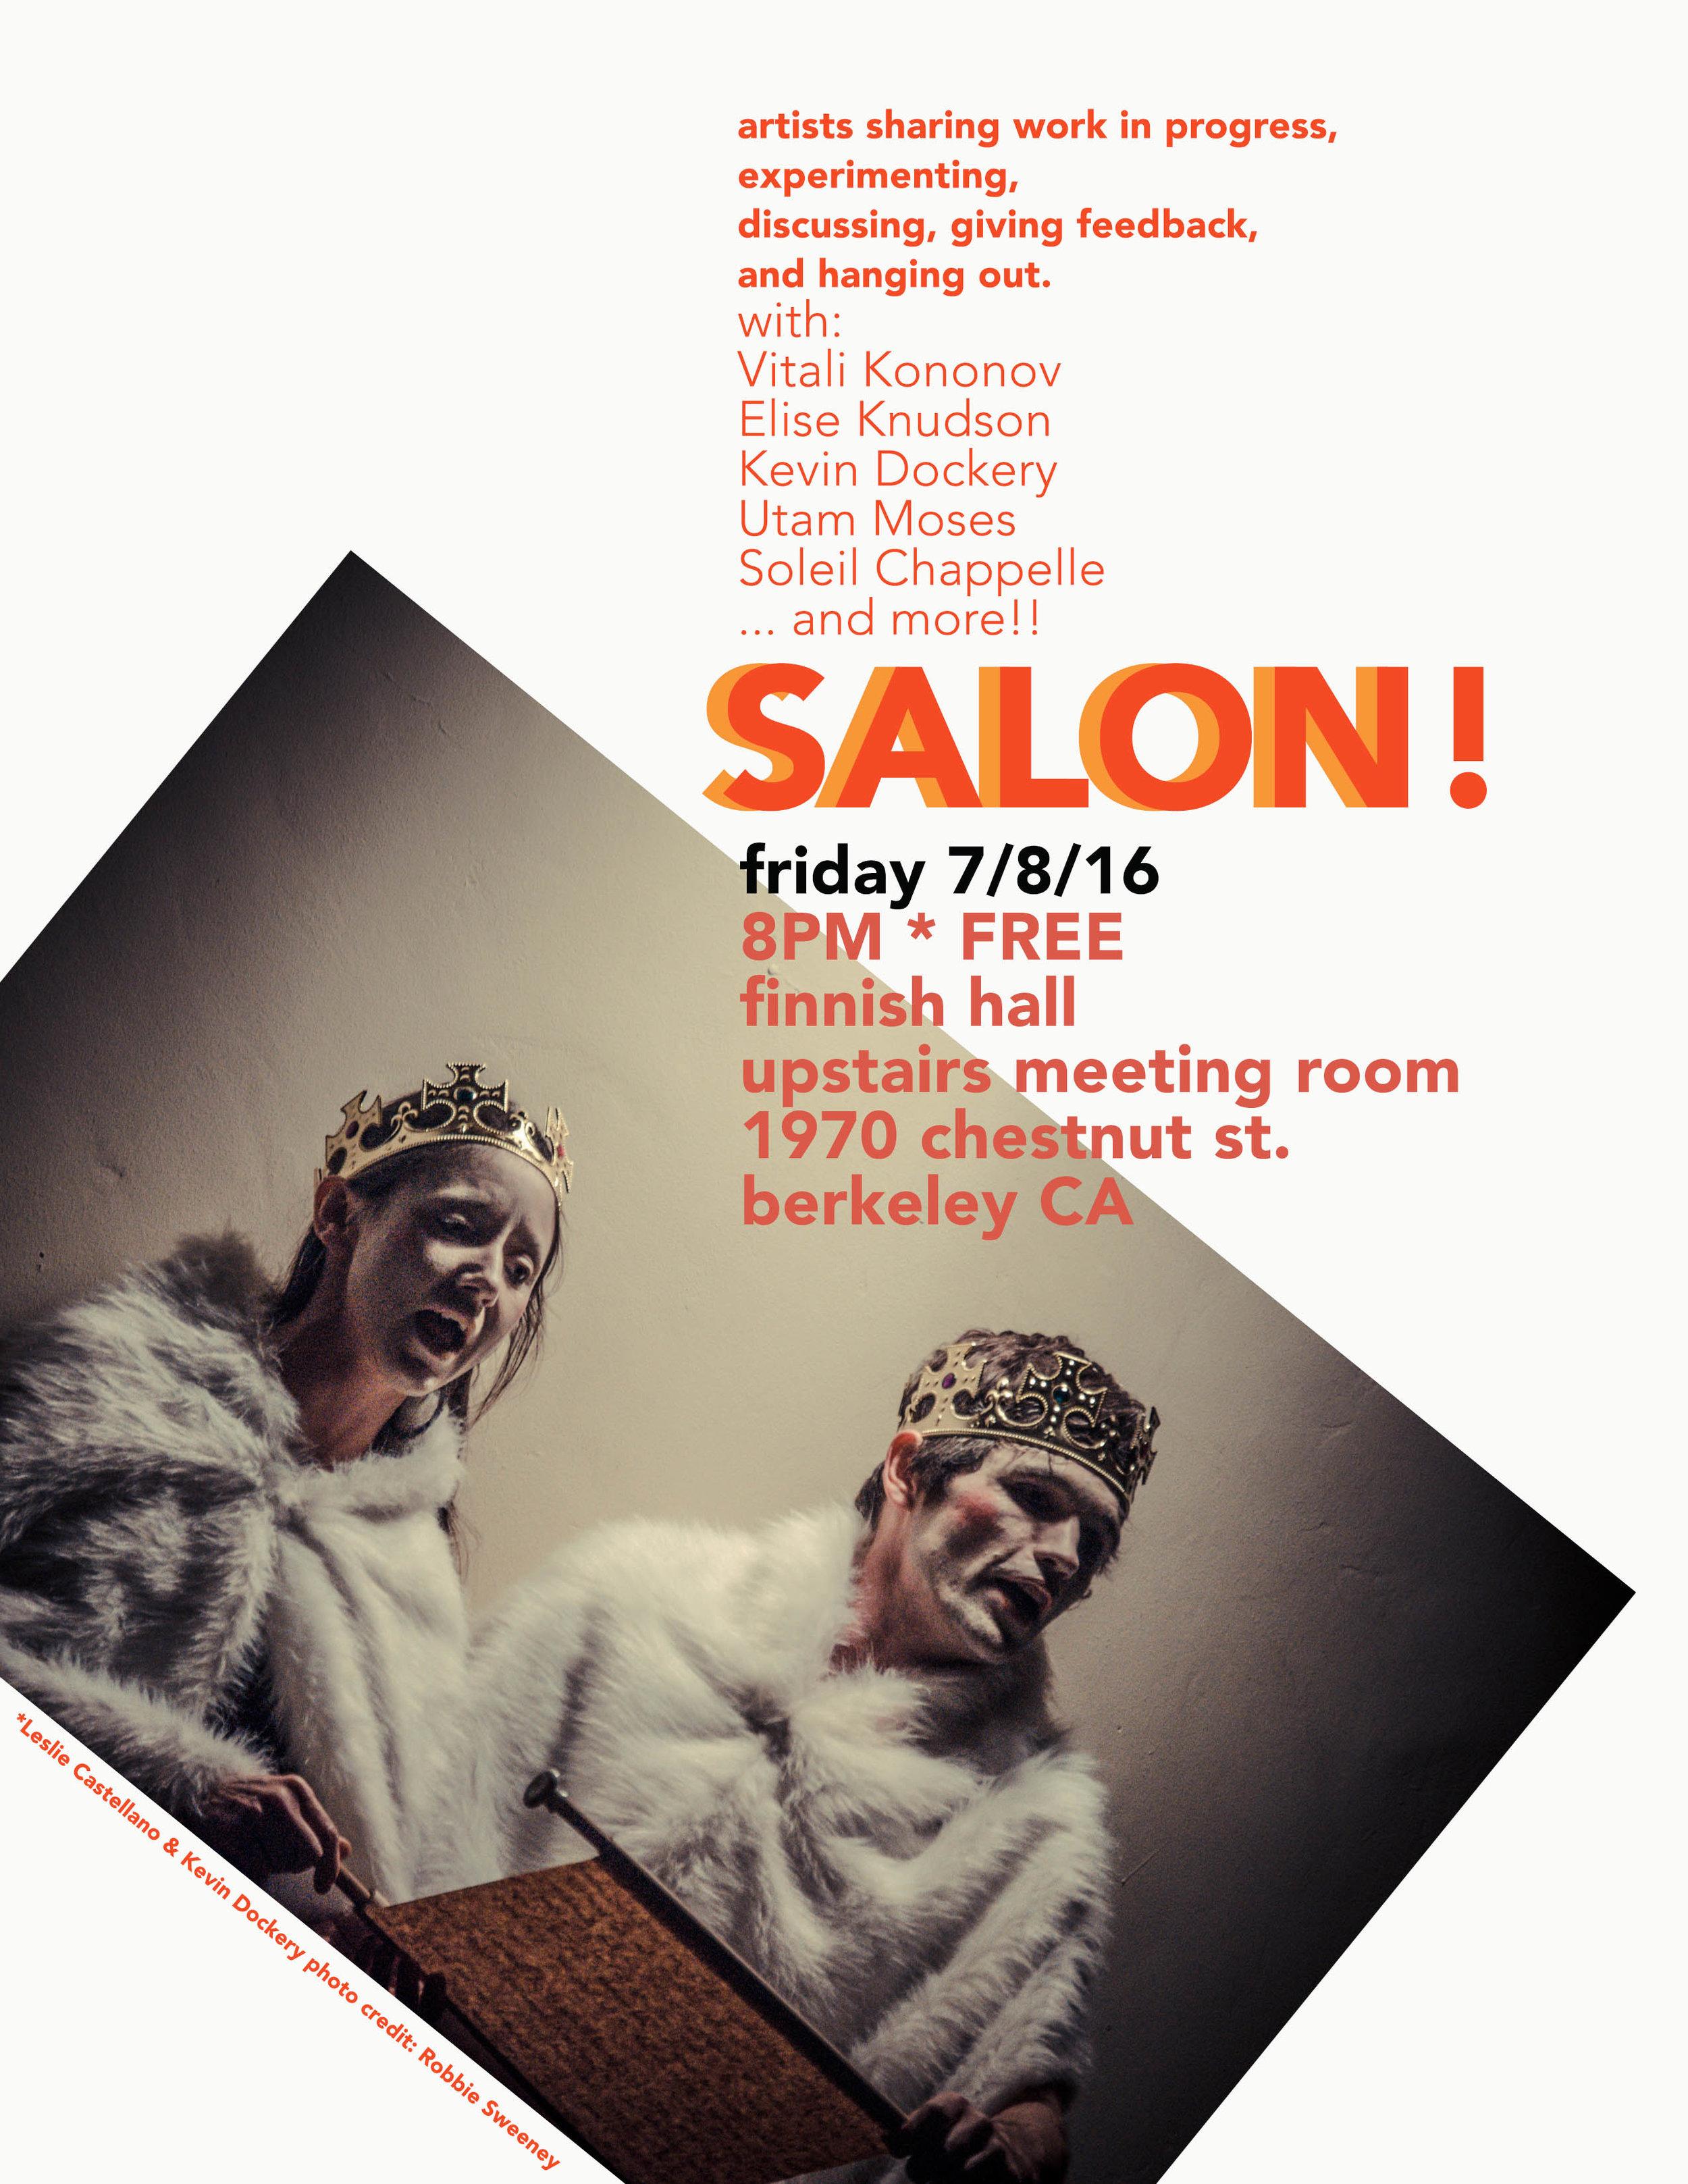 salon poster 7 18 16.jpg